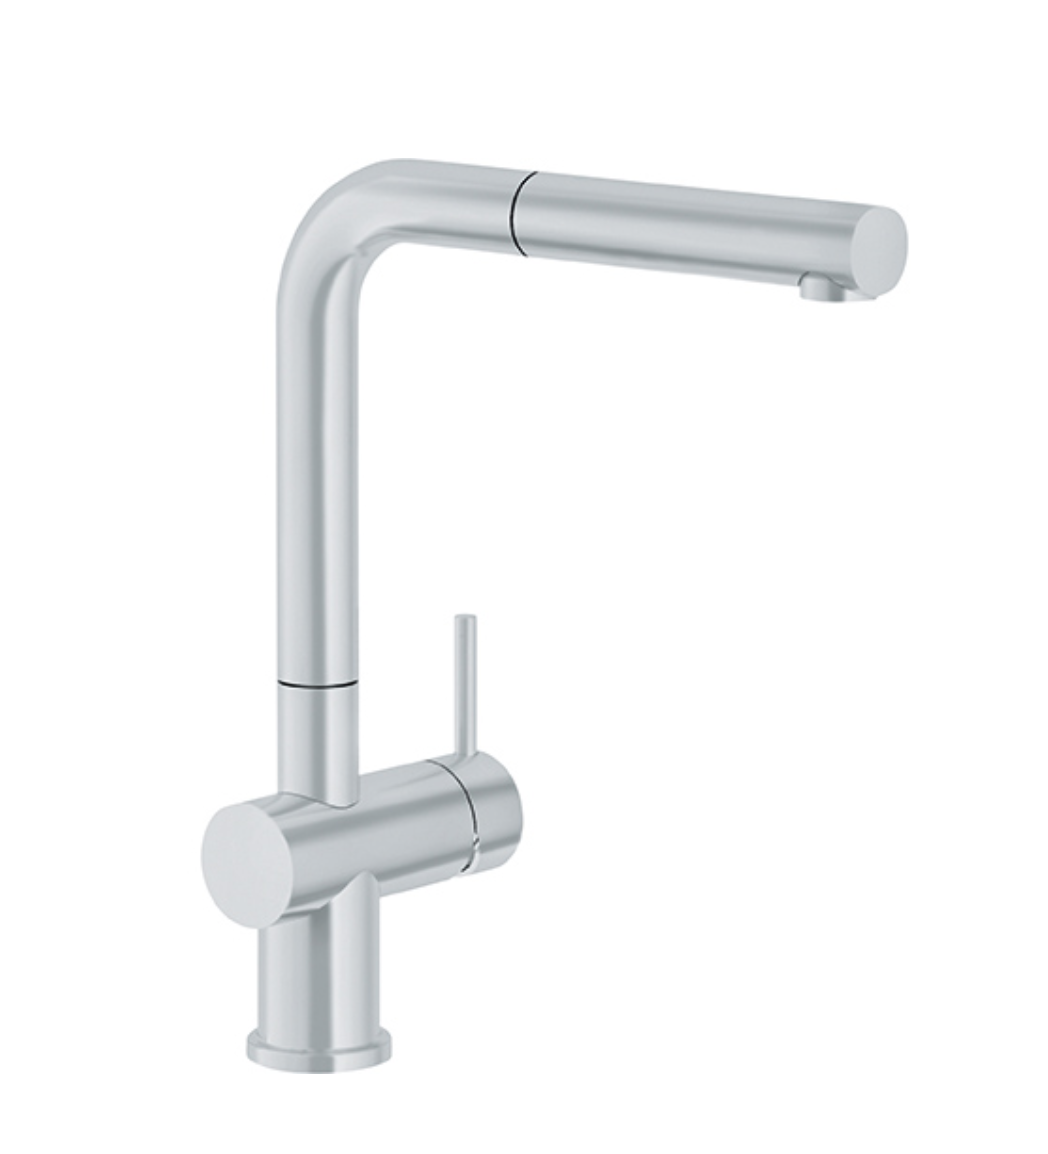 The Franke Active Plus utility faucet.